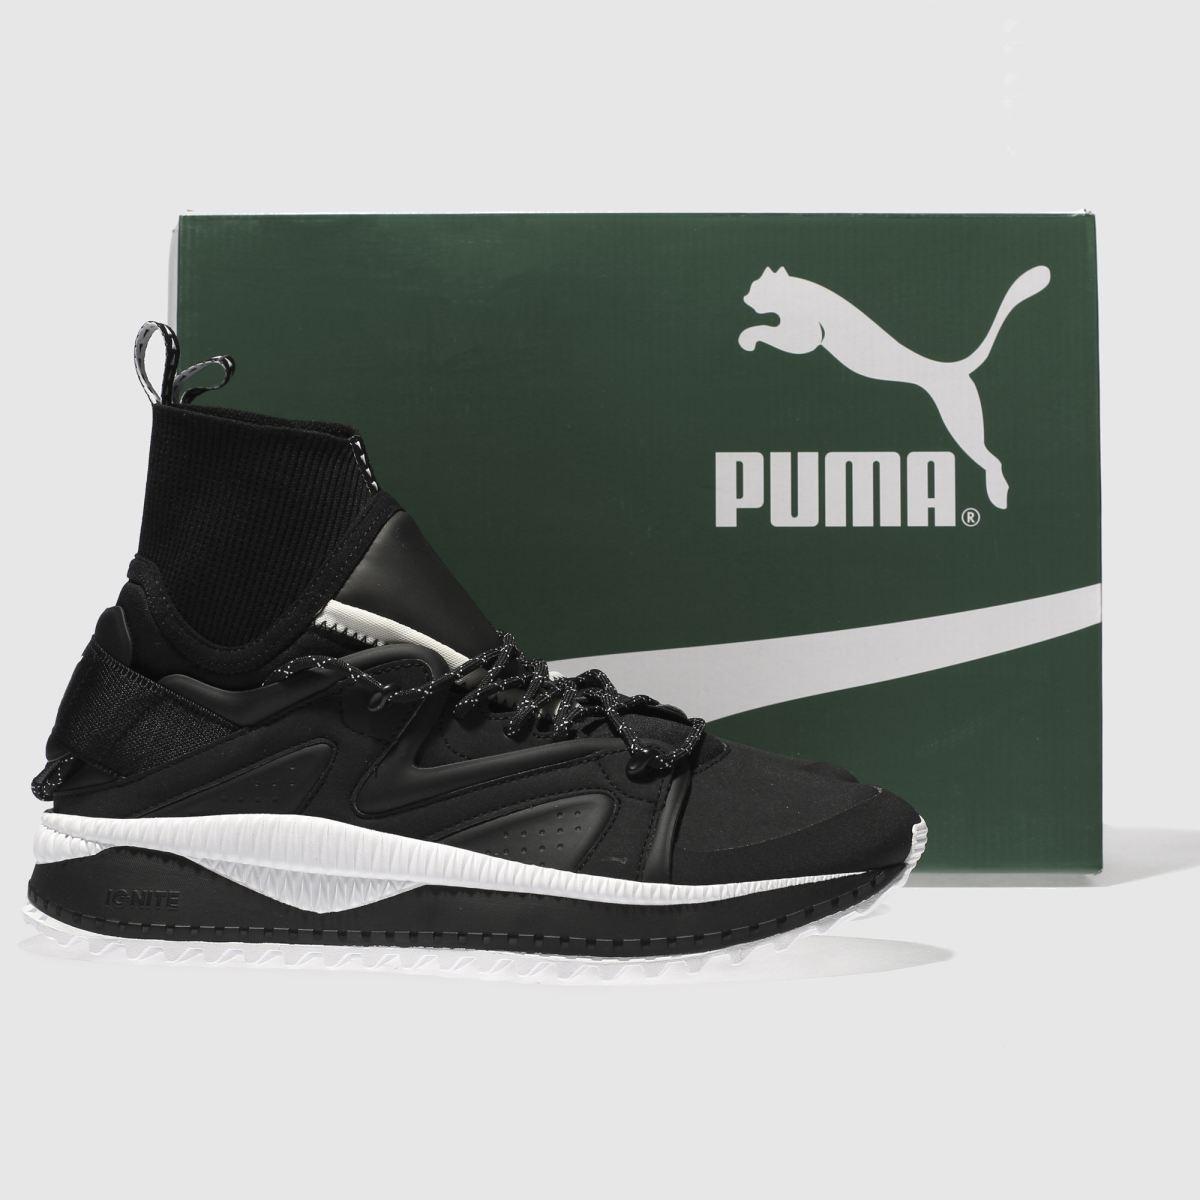 Puma Black & White Tsugi Kori Trainers £39.99 @ Schuh